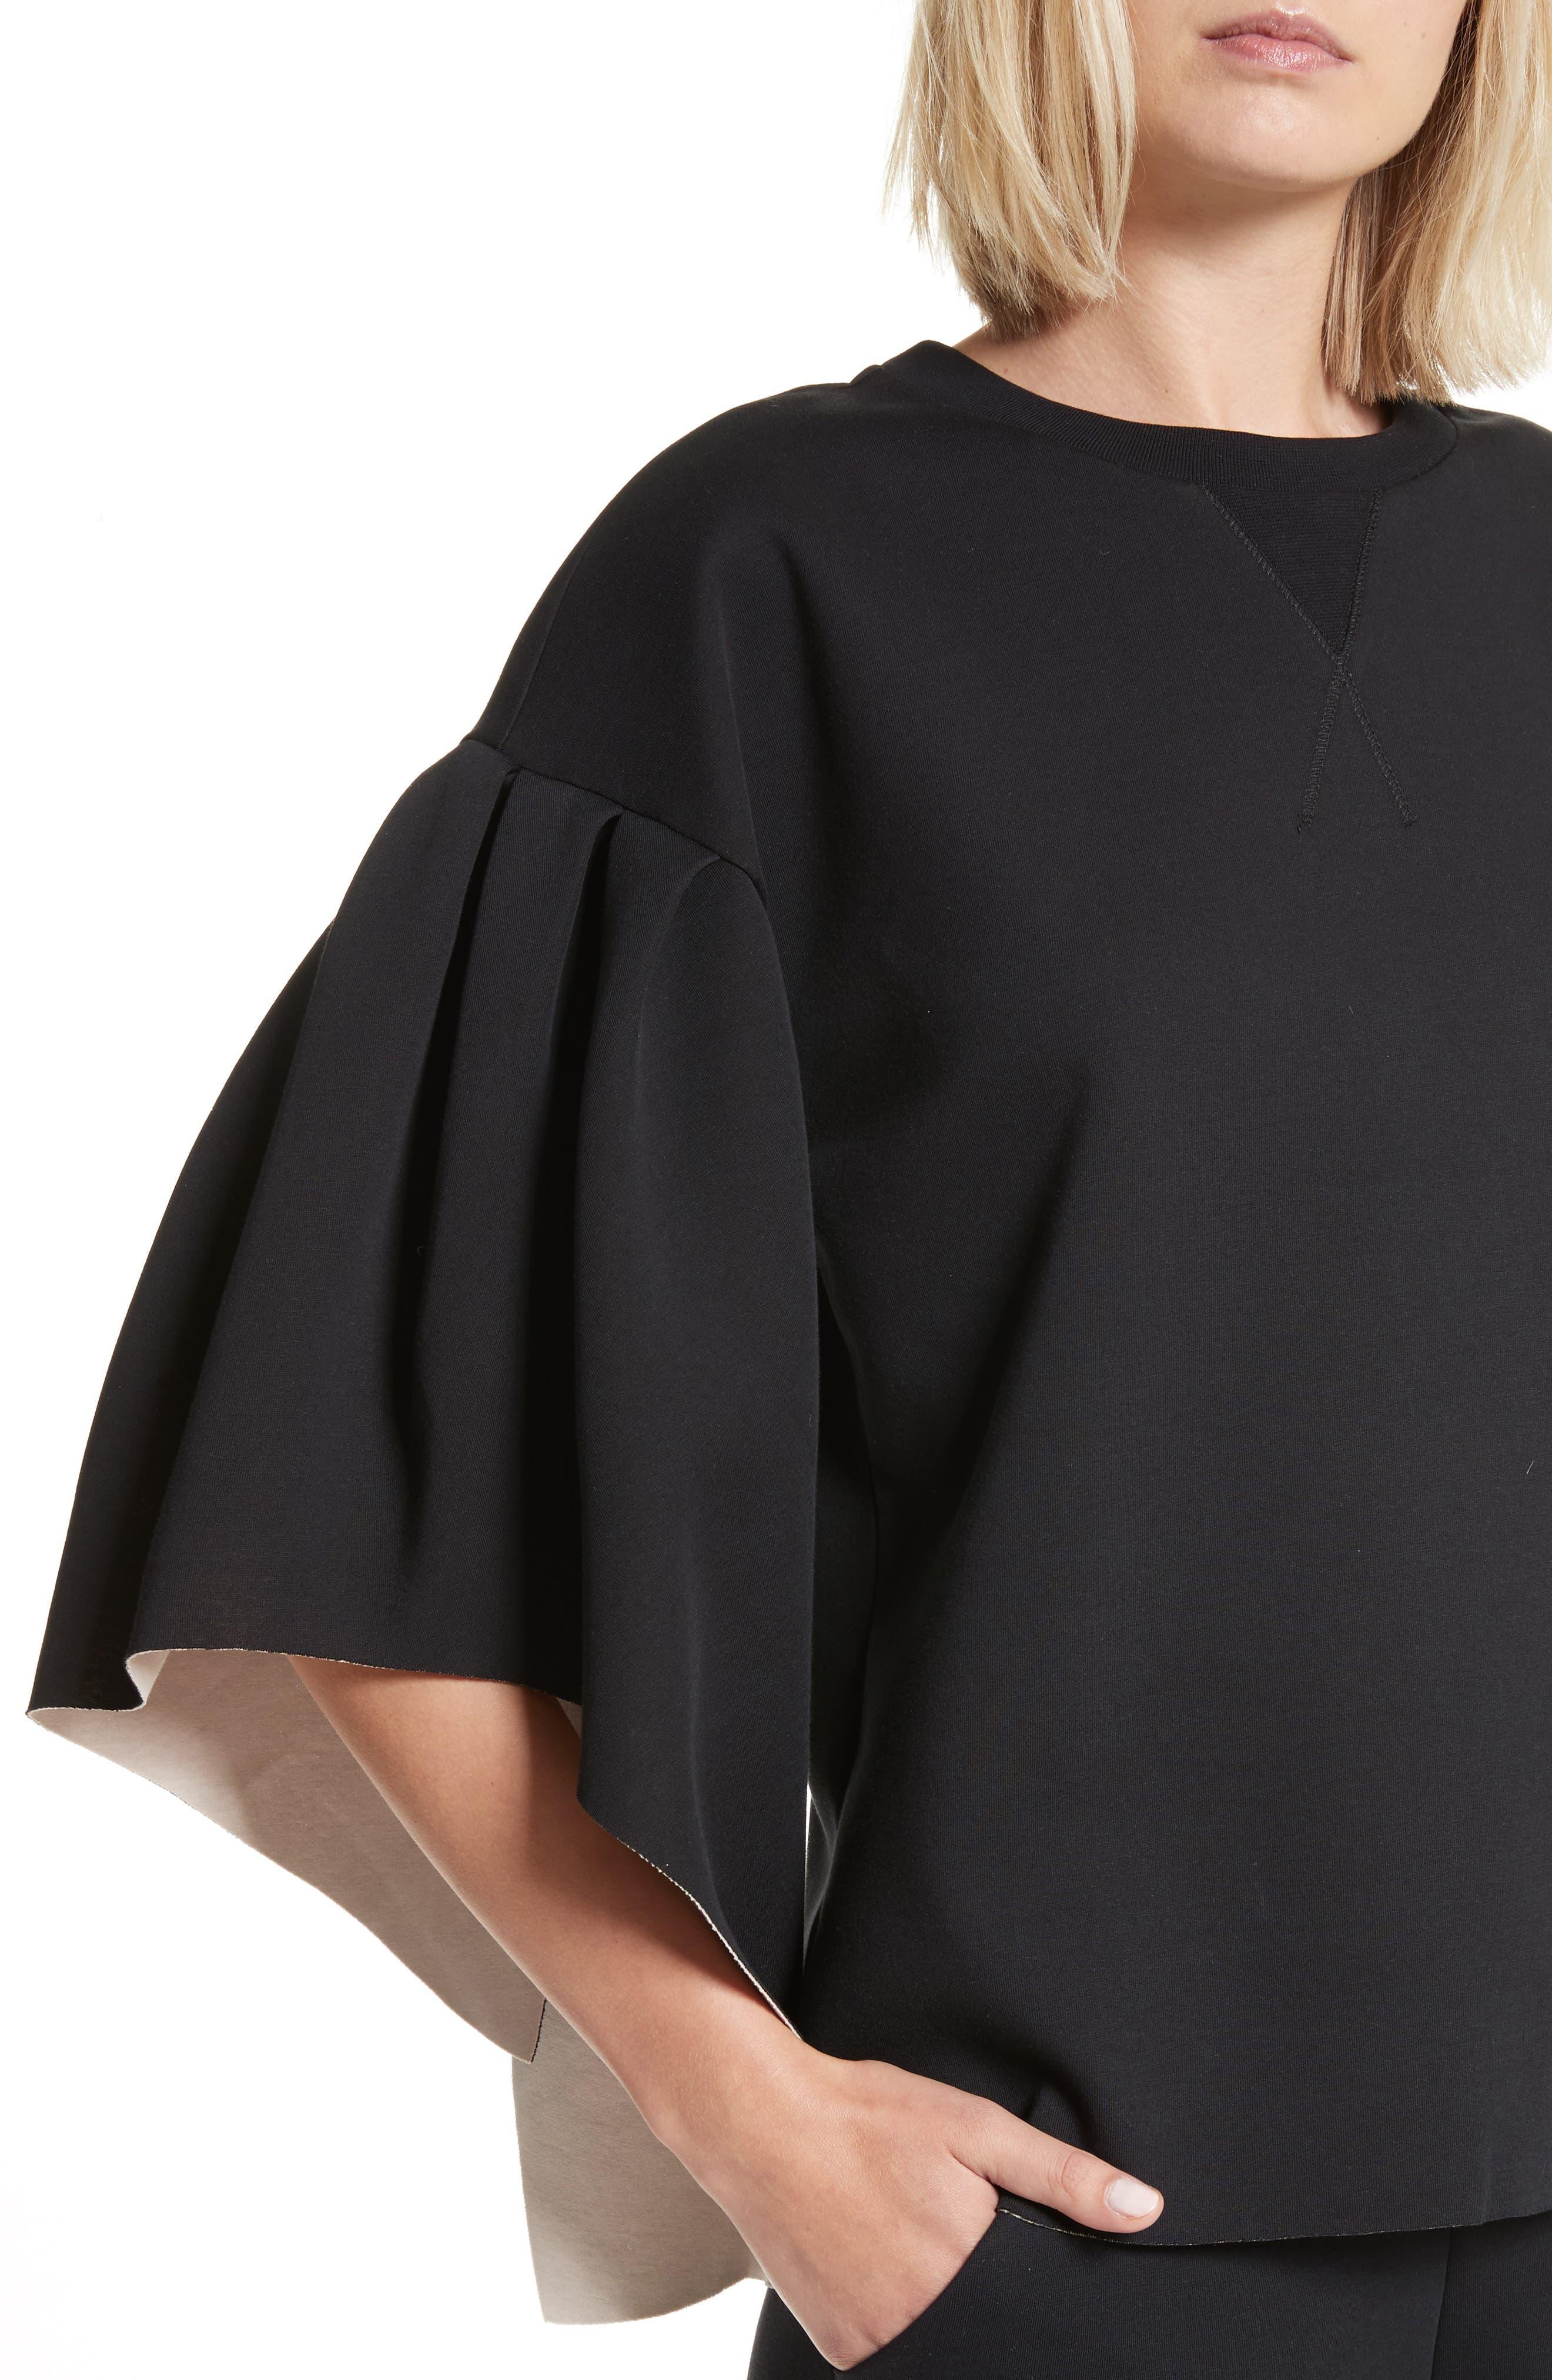 Orcher Full Sleeve Sweatshirt,                             Alternate thumbnail 4, color,                             001